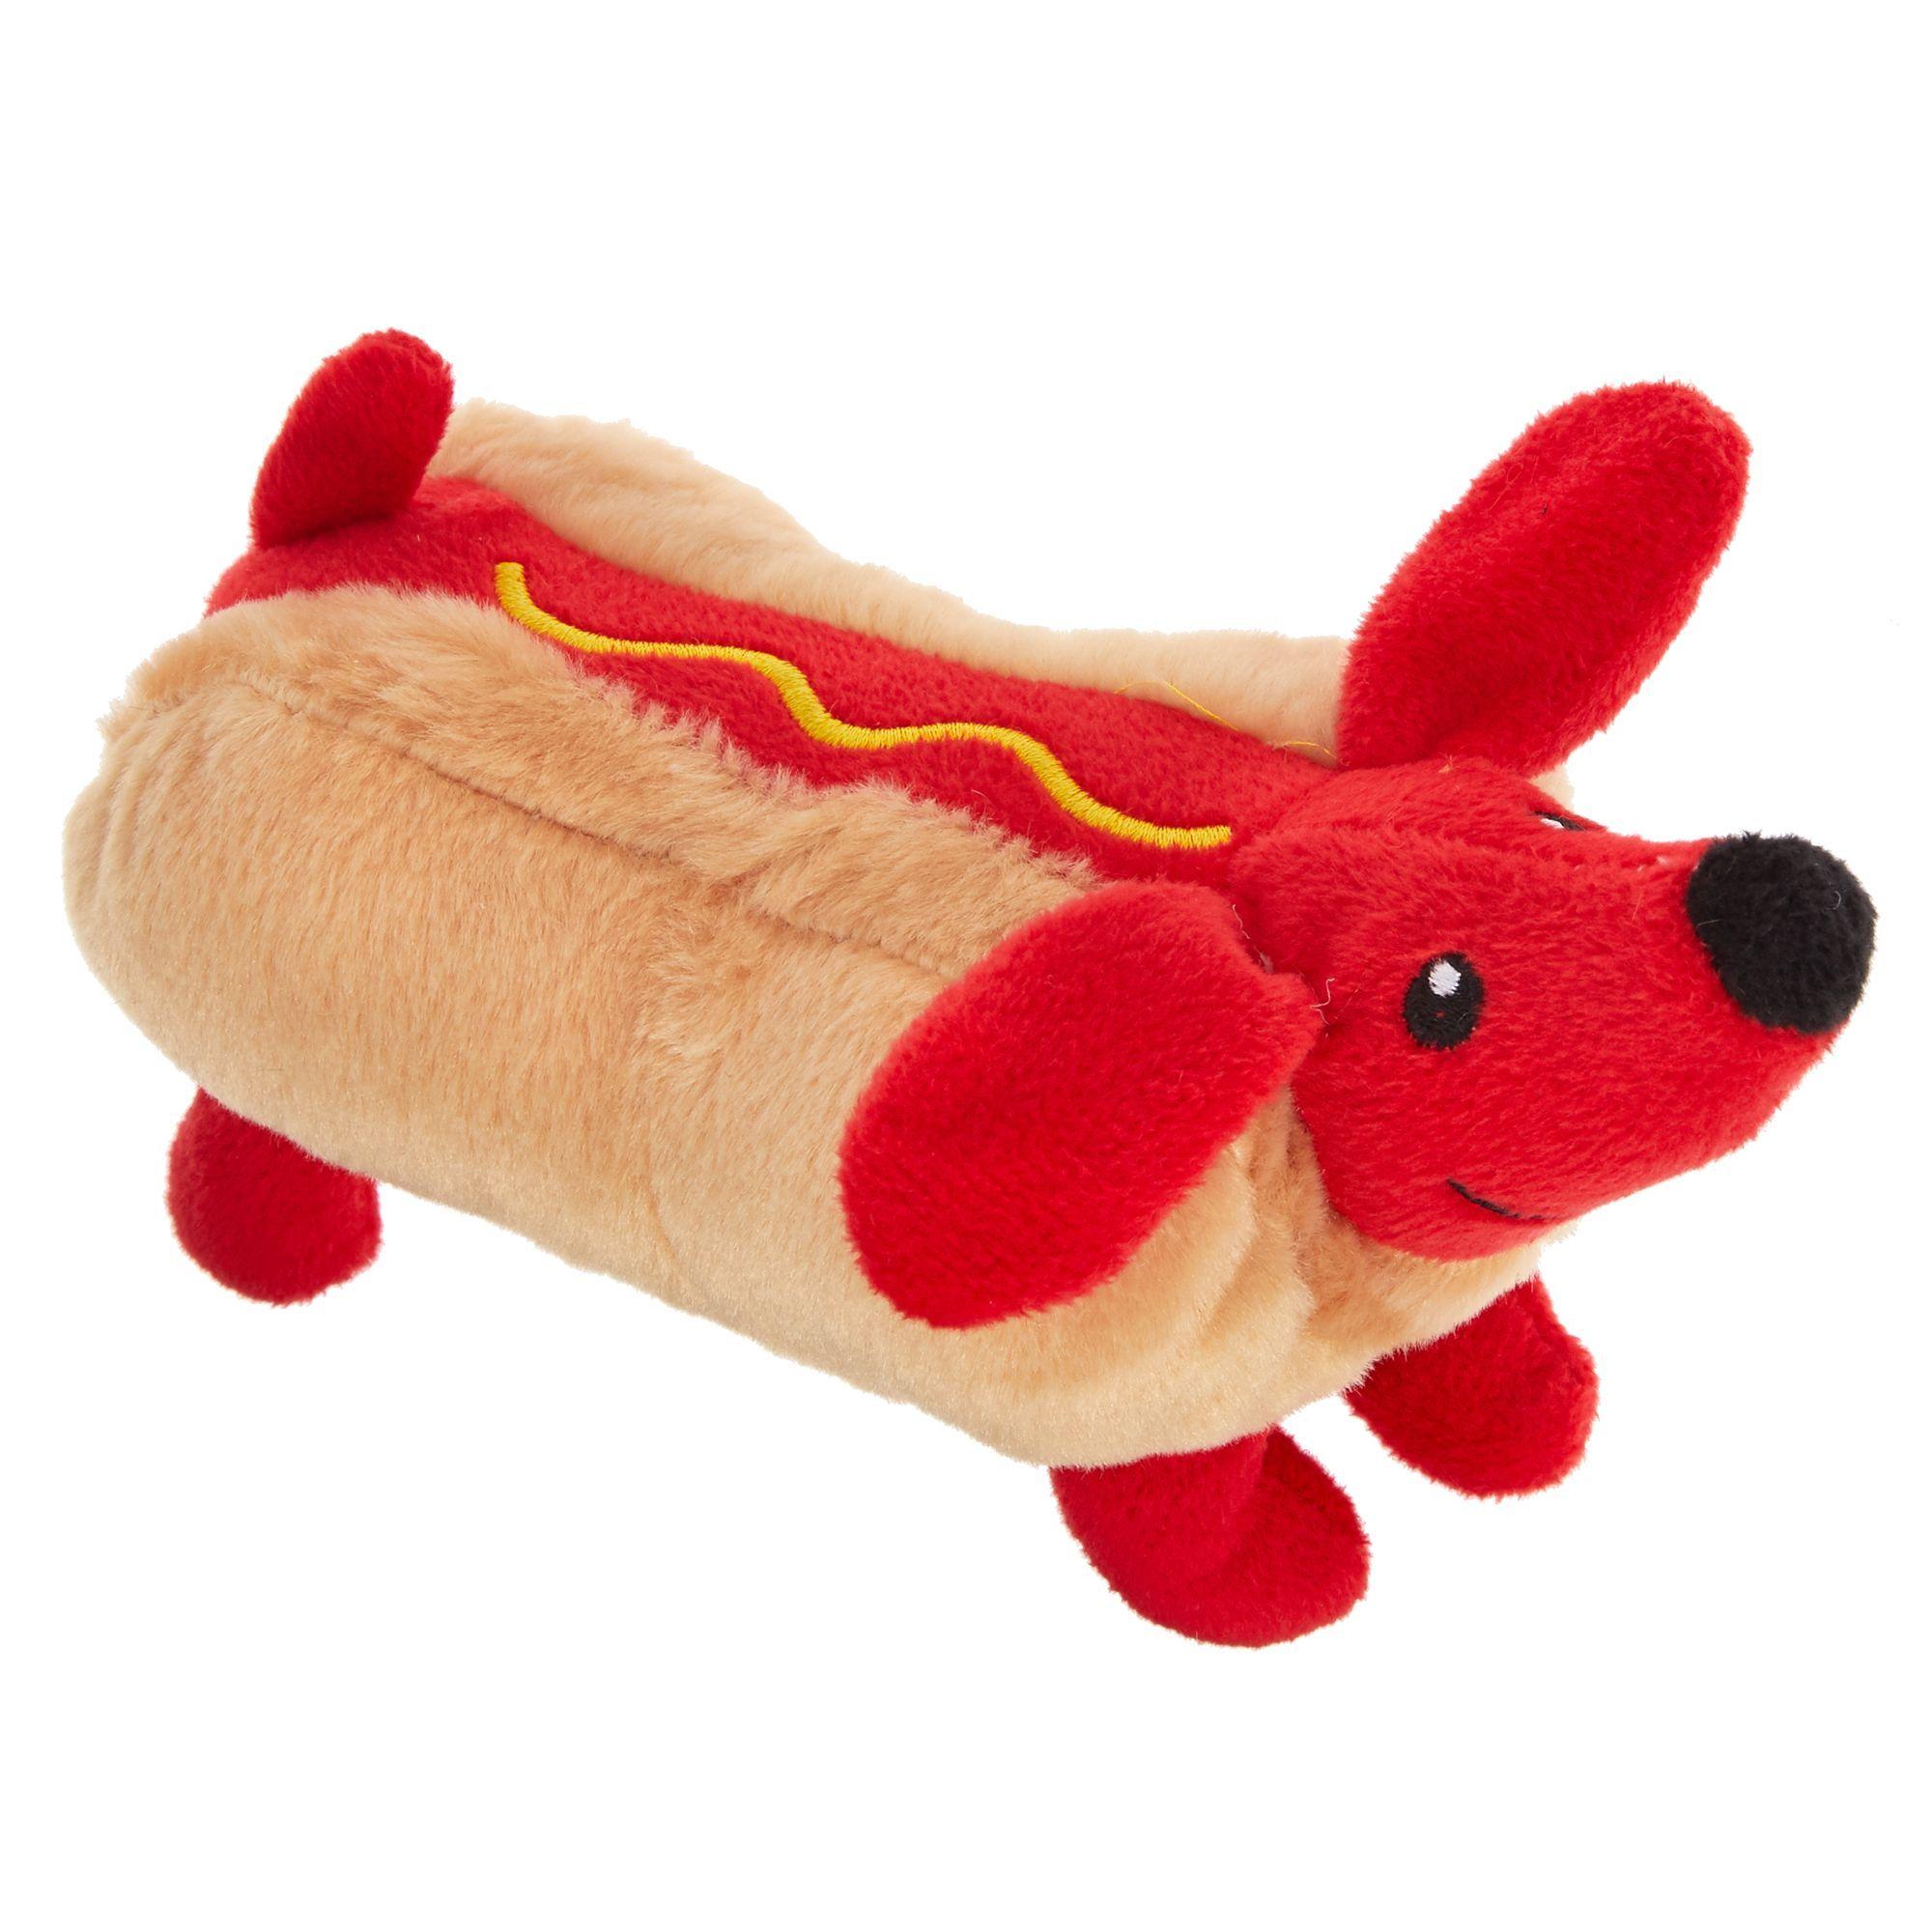 Thrills and Chills, Halloween Wiener Hot Dog Toy Plush